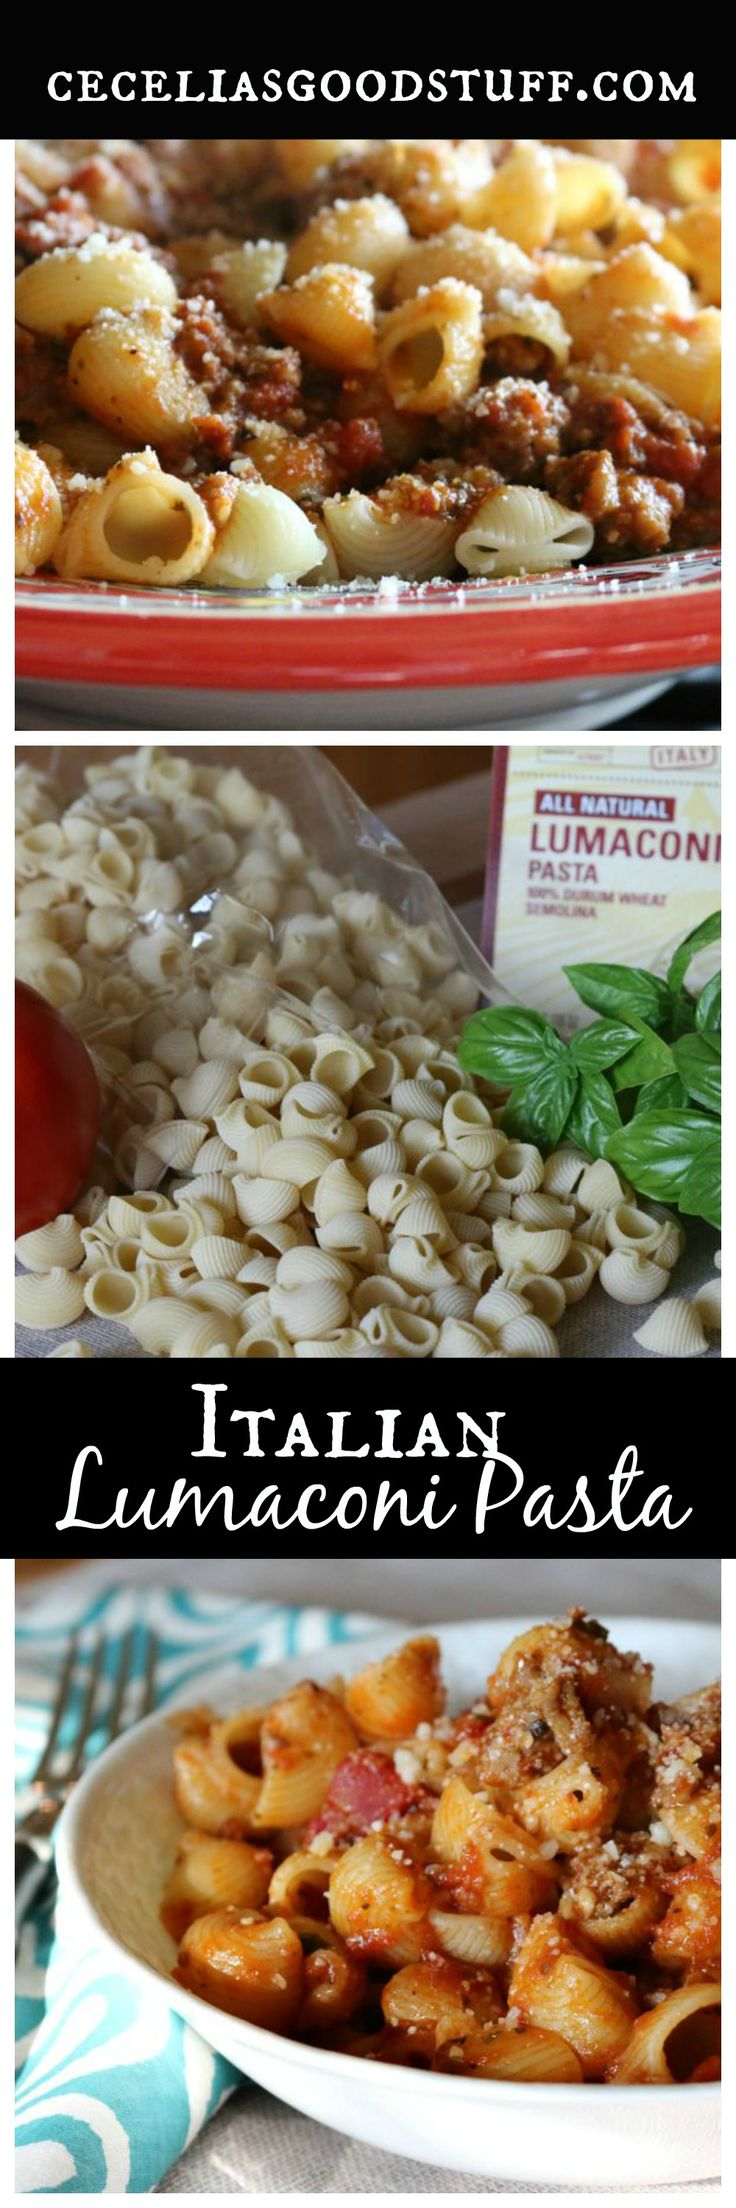 Italian Lumaconi Pasta with Sweet Italian Sausage - http://ceceliasgoodstuff.com/lumaconi-pasta-with-sweet-italian-sausage